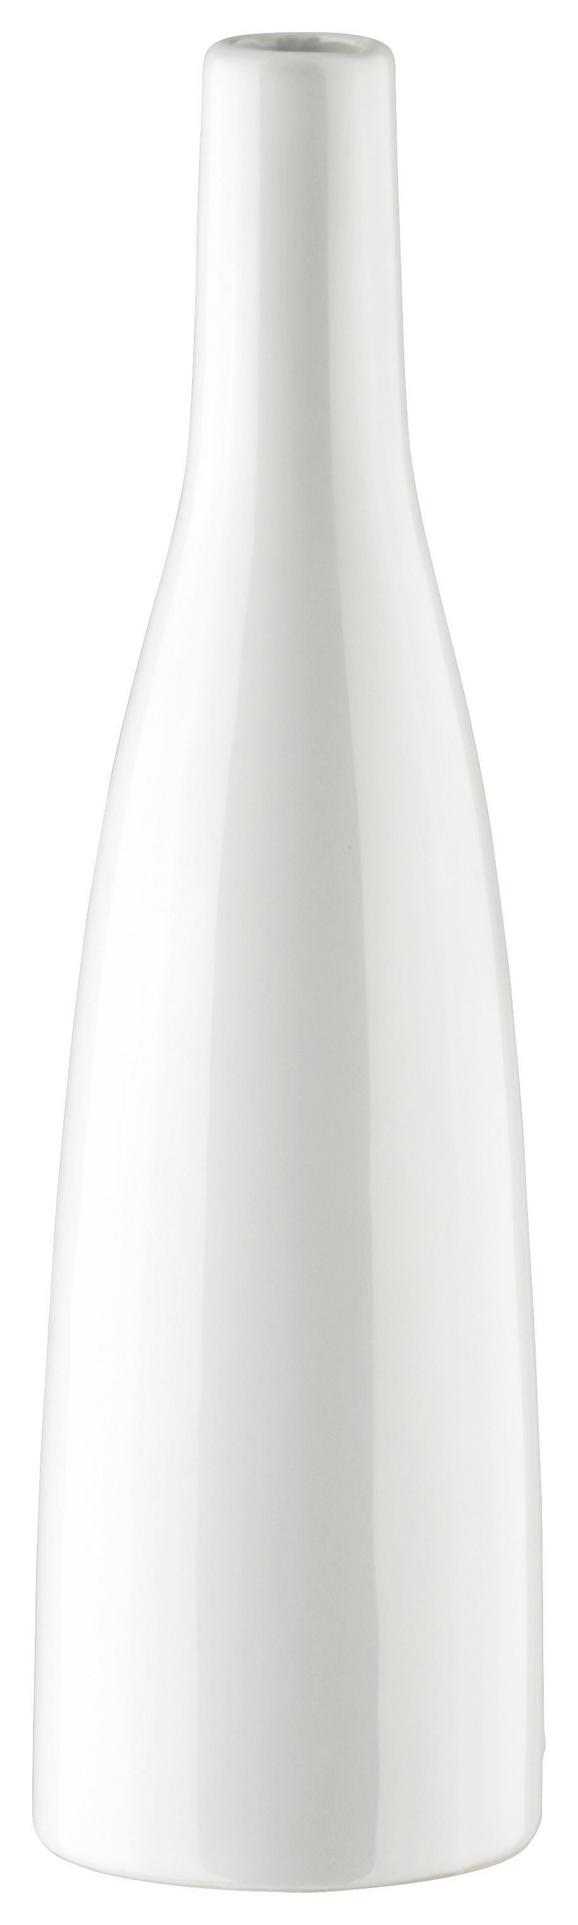 Váza Plancio - Fehér, modern, Kerámia (27cm) - Mömax modern living